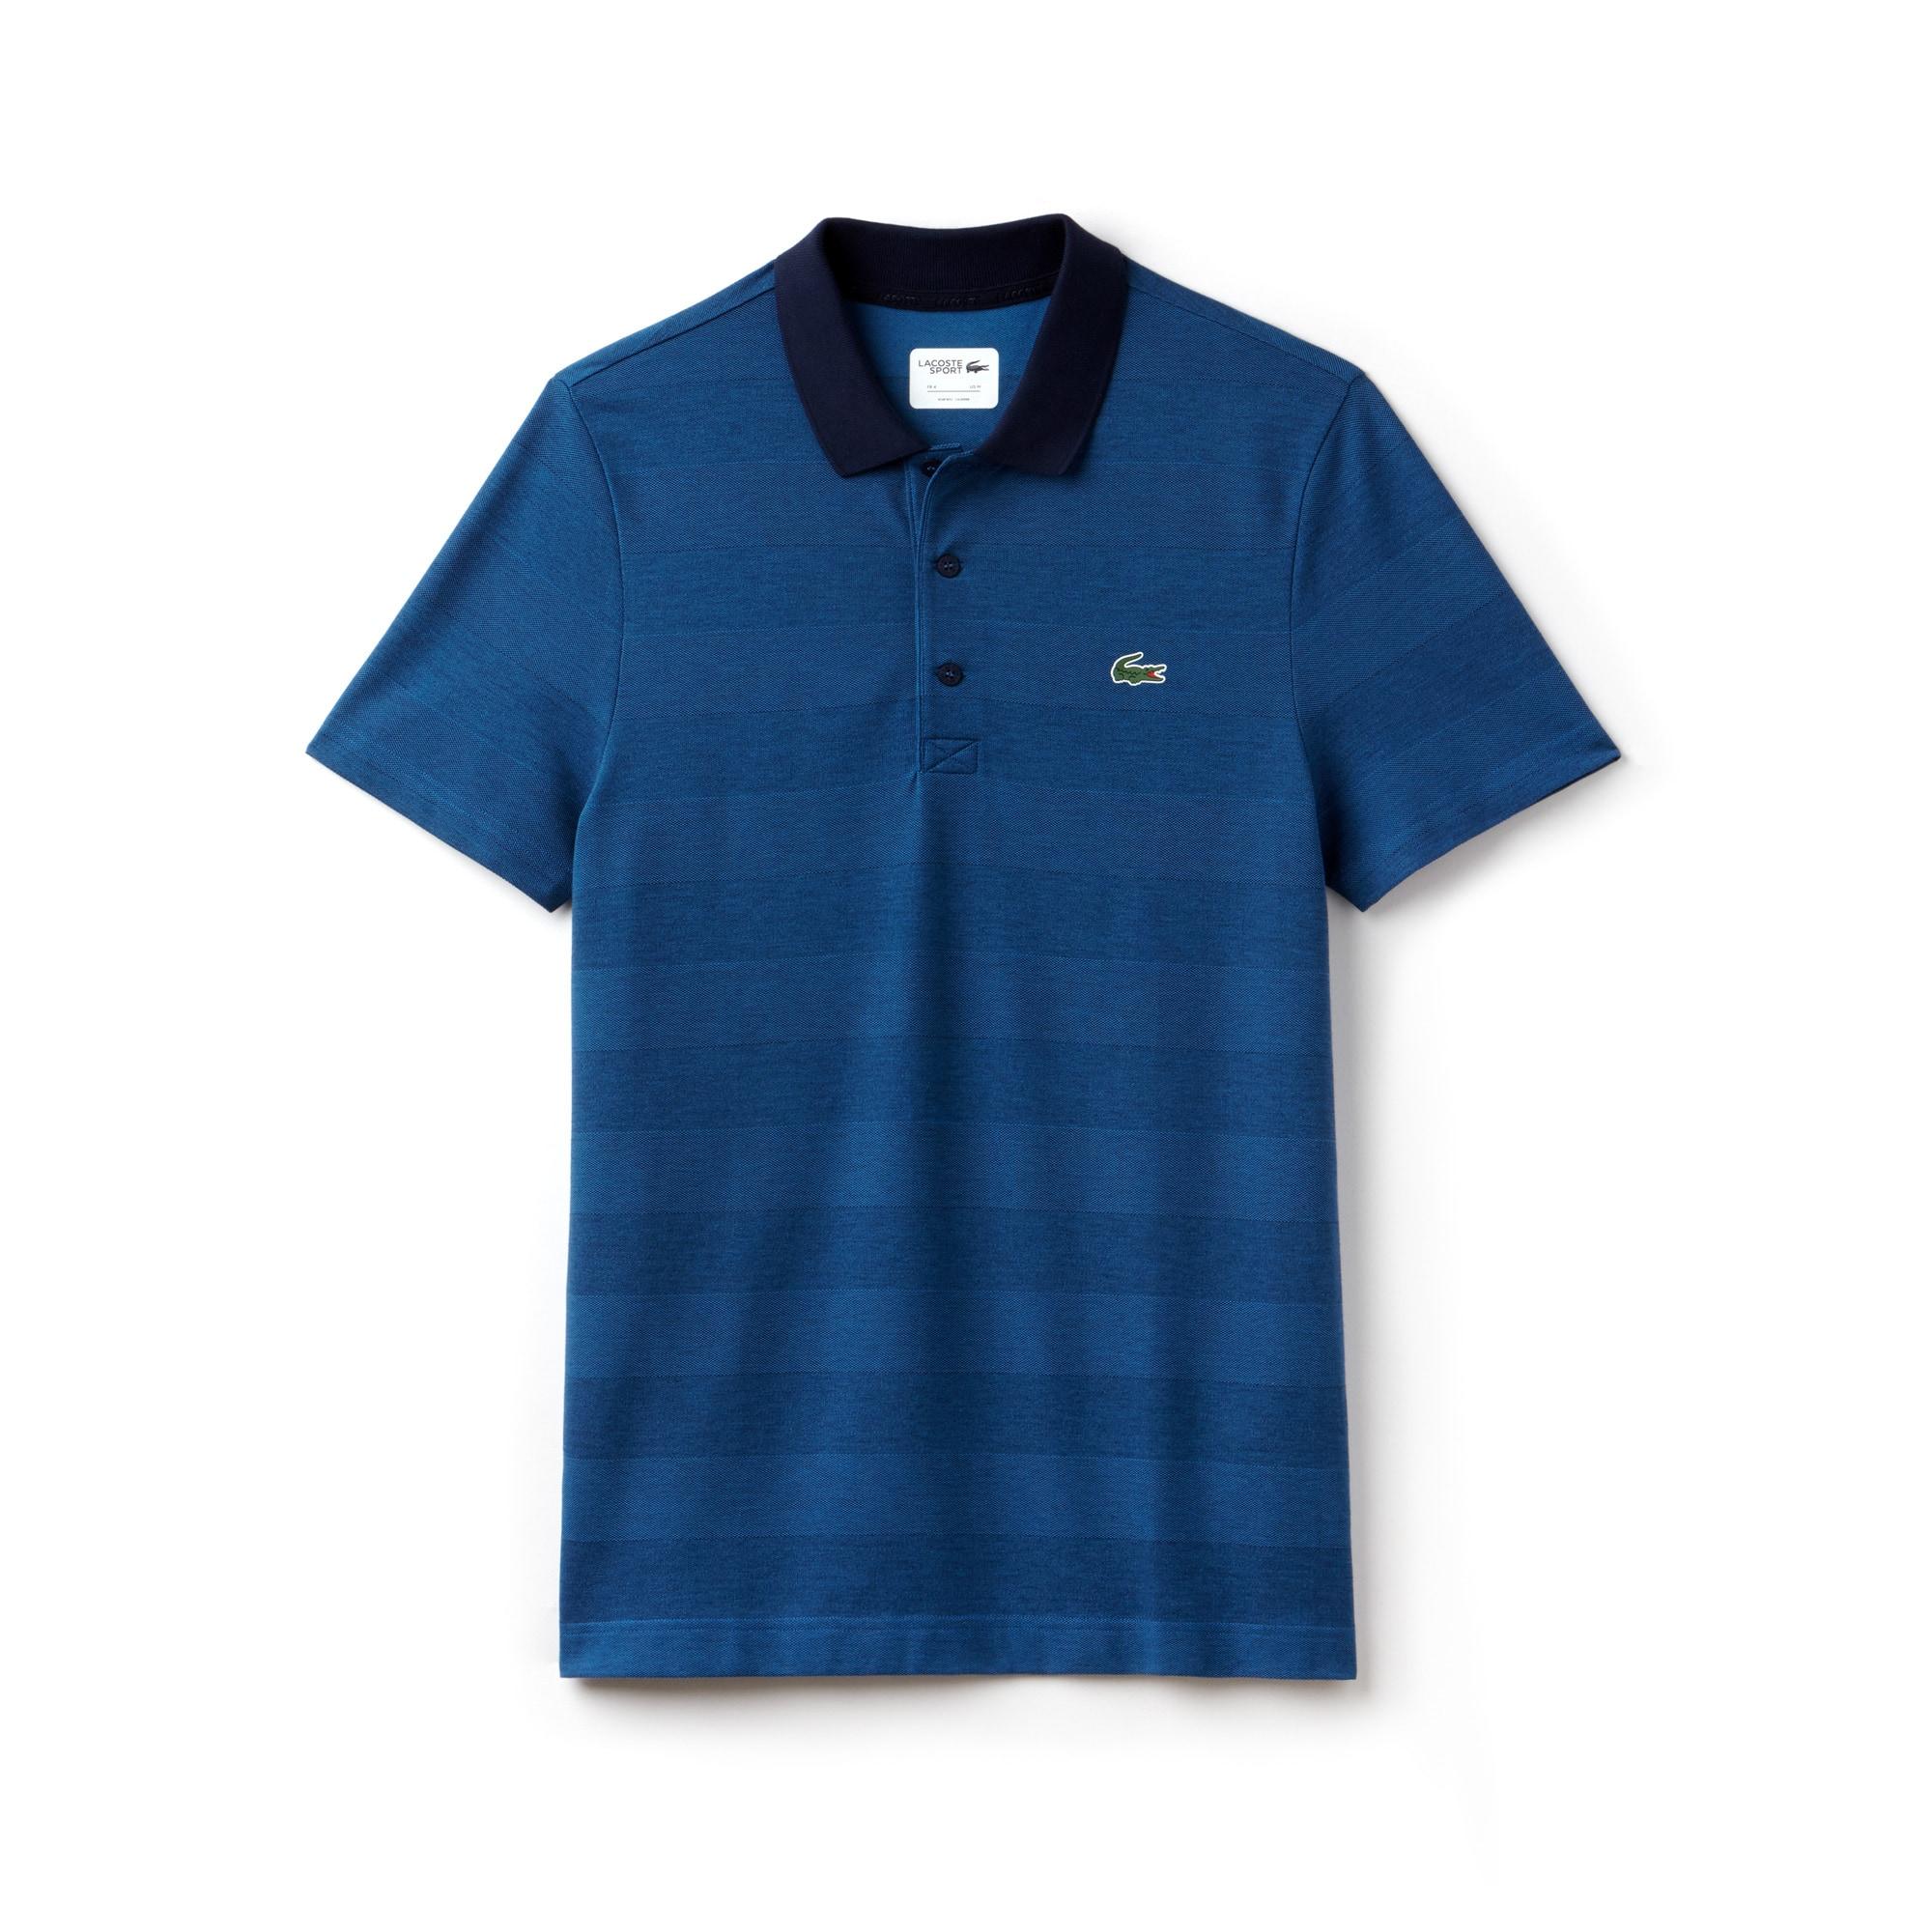 Polo Golf Lacoste SPORT en jersey technique